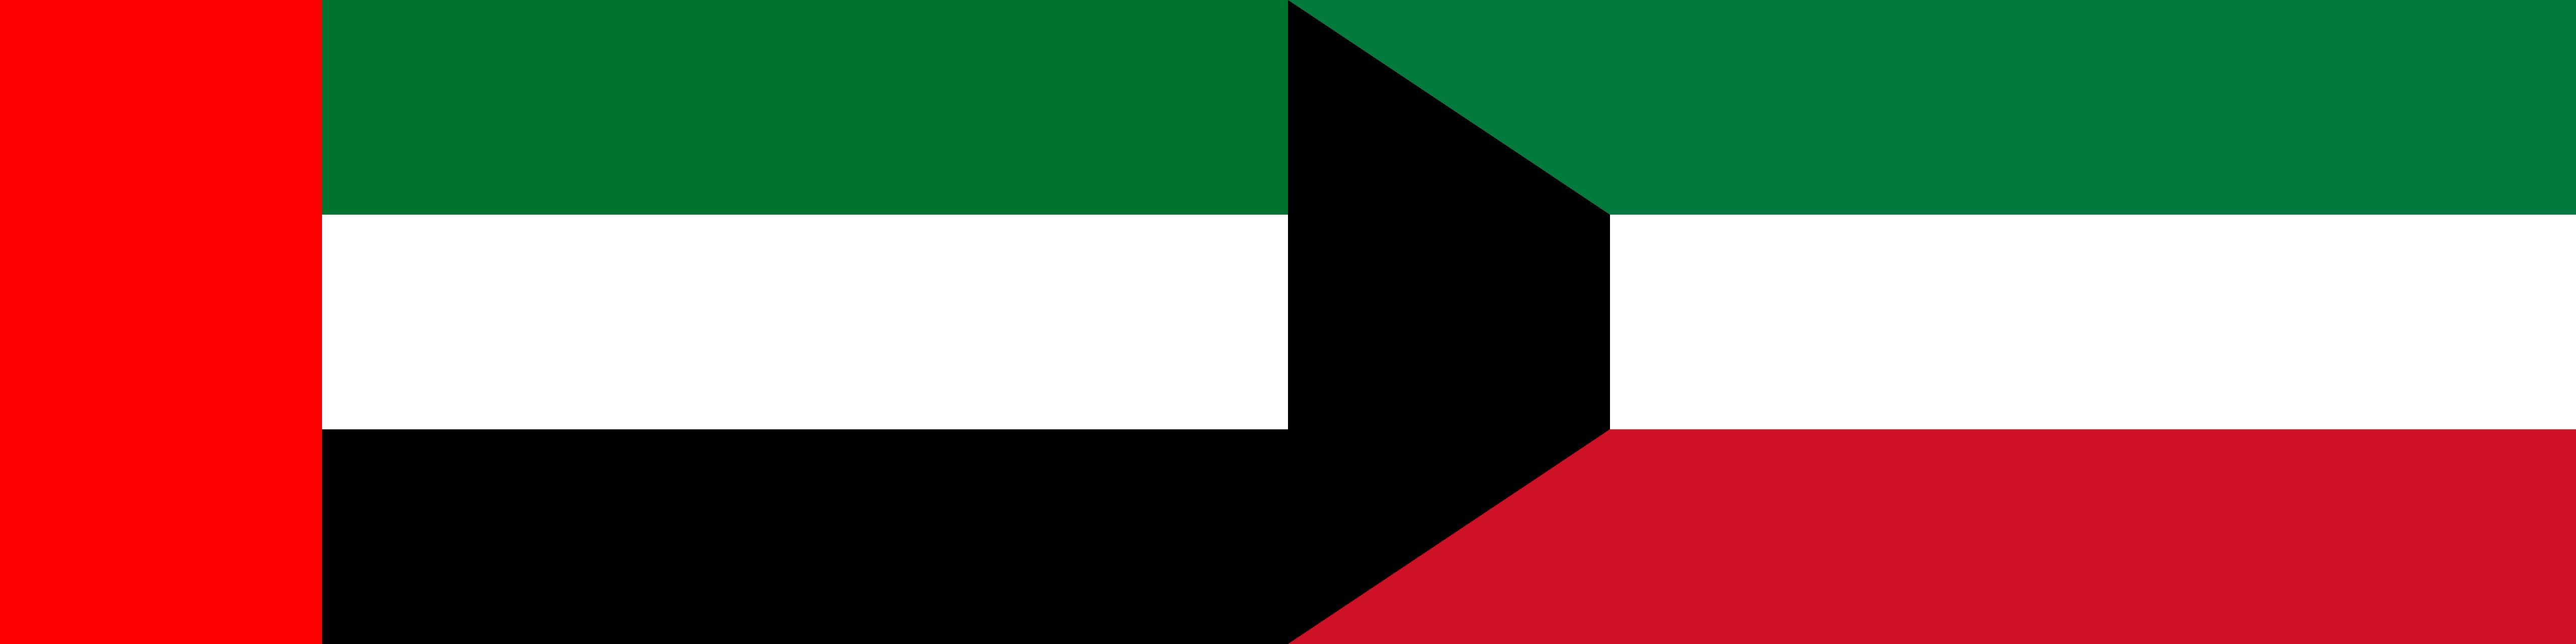 UAE and Kuwait flags